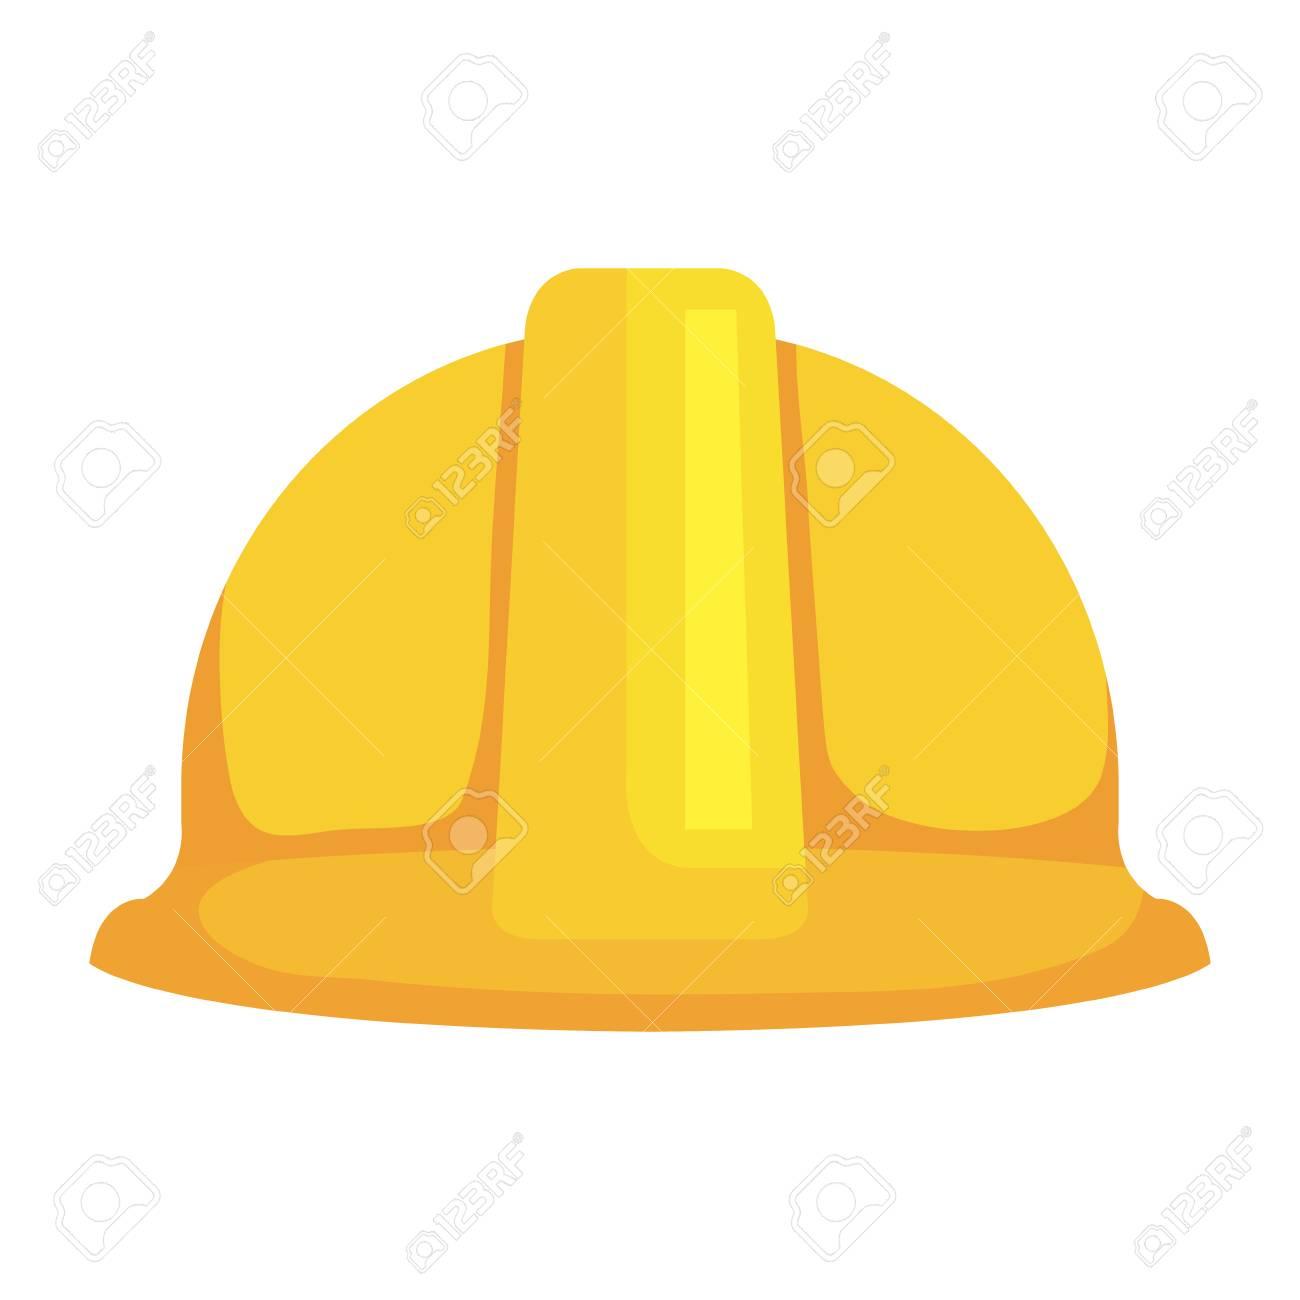 construction helmet protection icon vector illustration design - 123390186